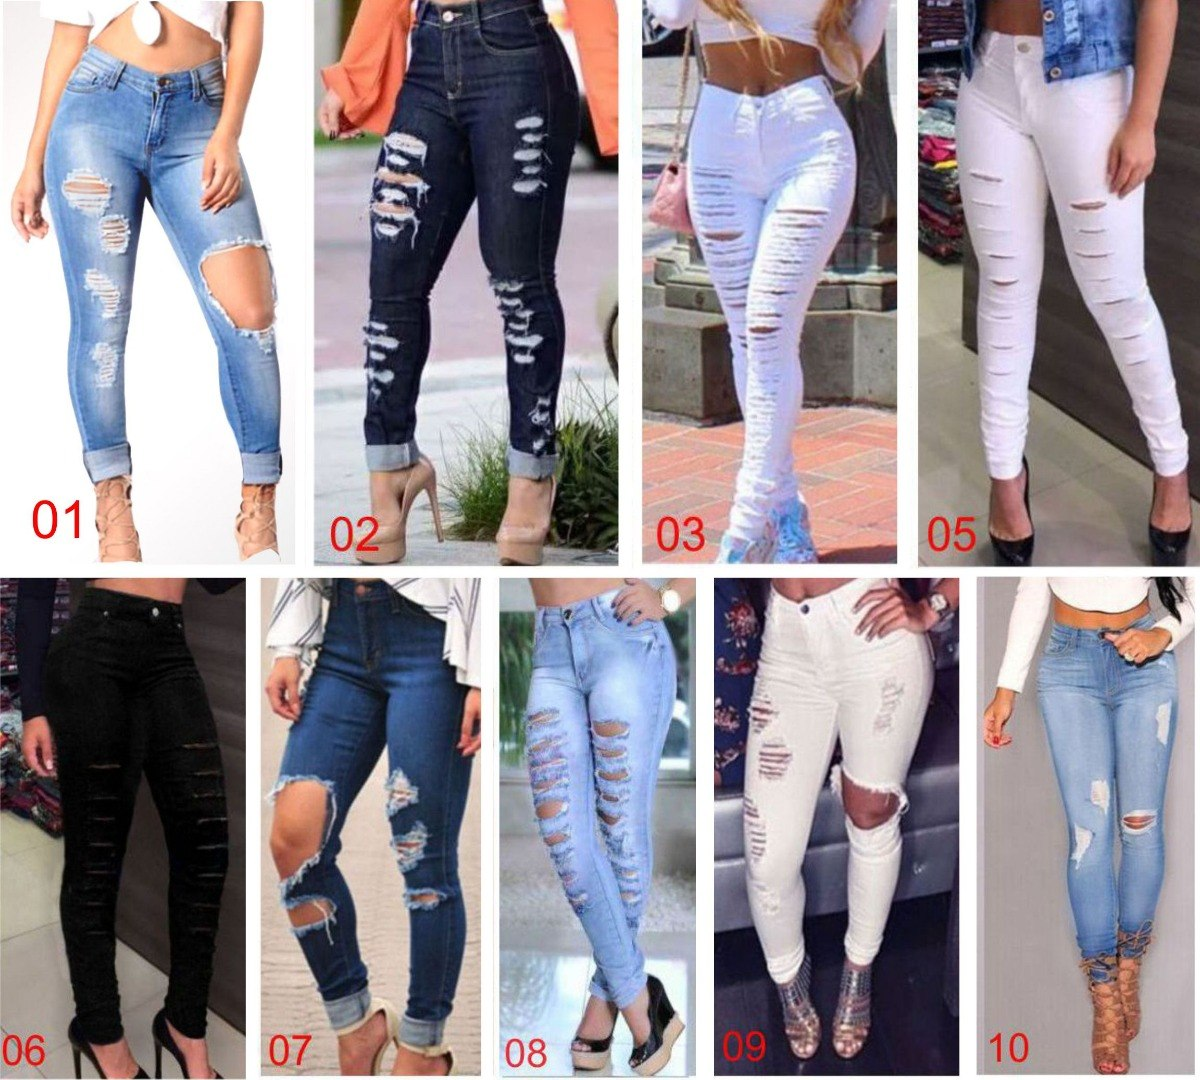 a3a696cb4 calça jeans feminina hot pants lycra bumbum rasgada dins. Carregando zoom.